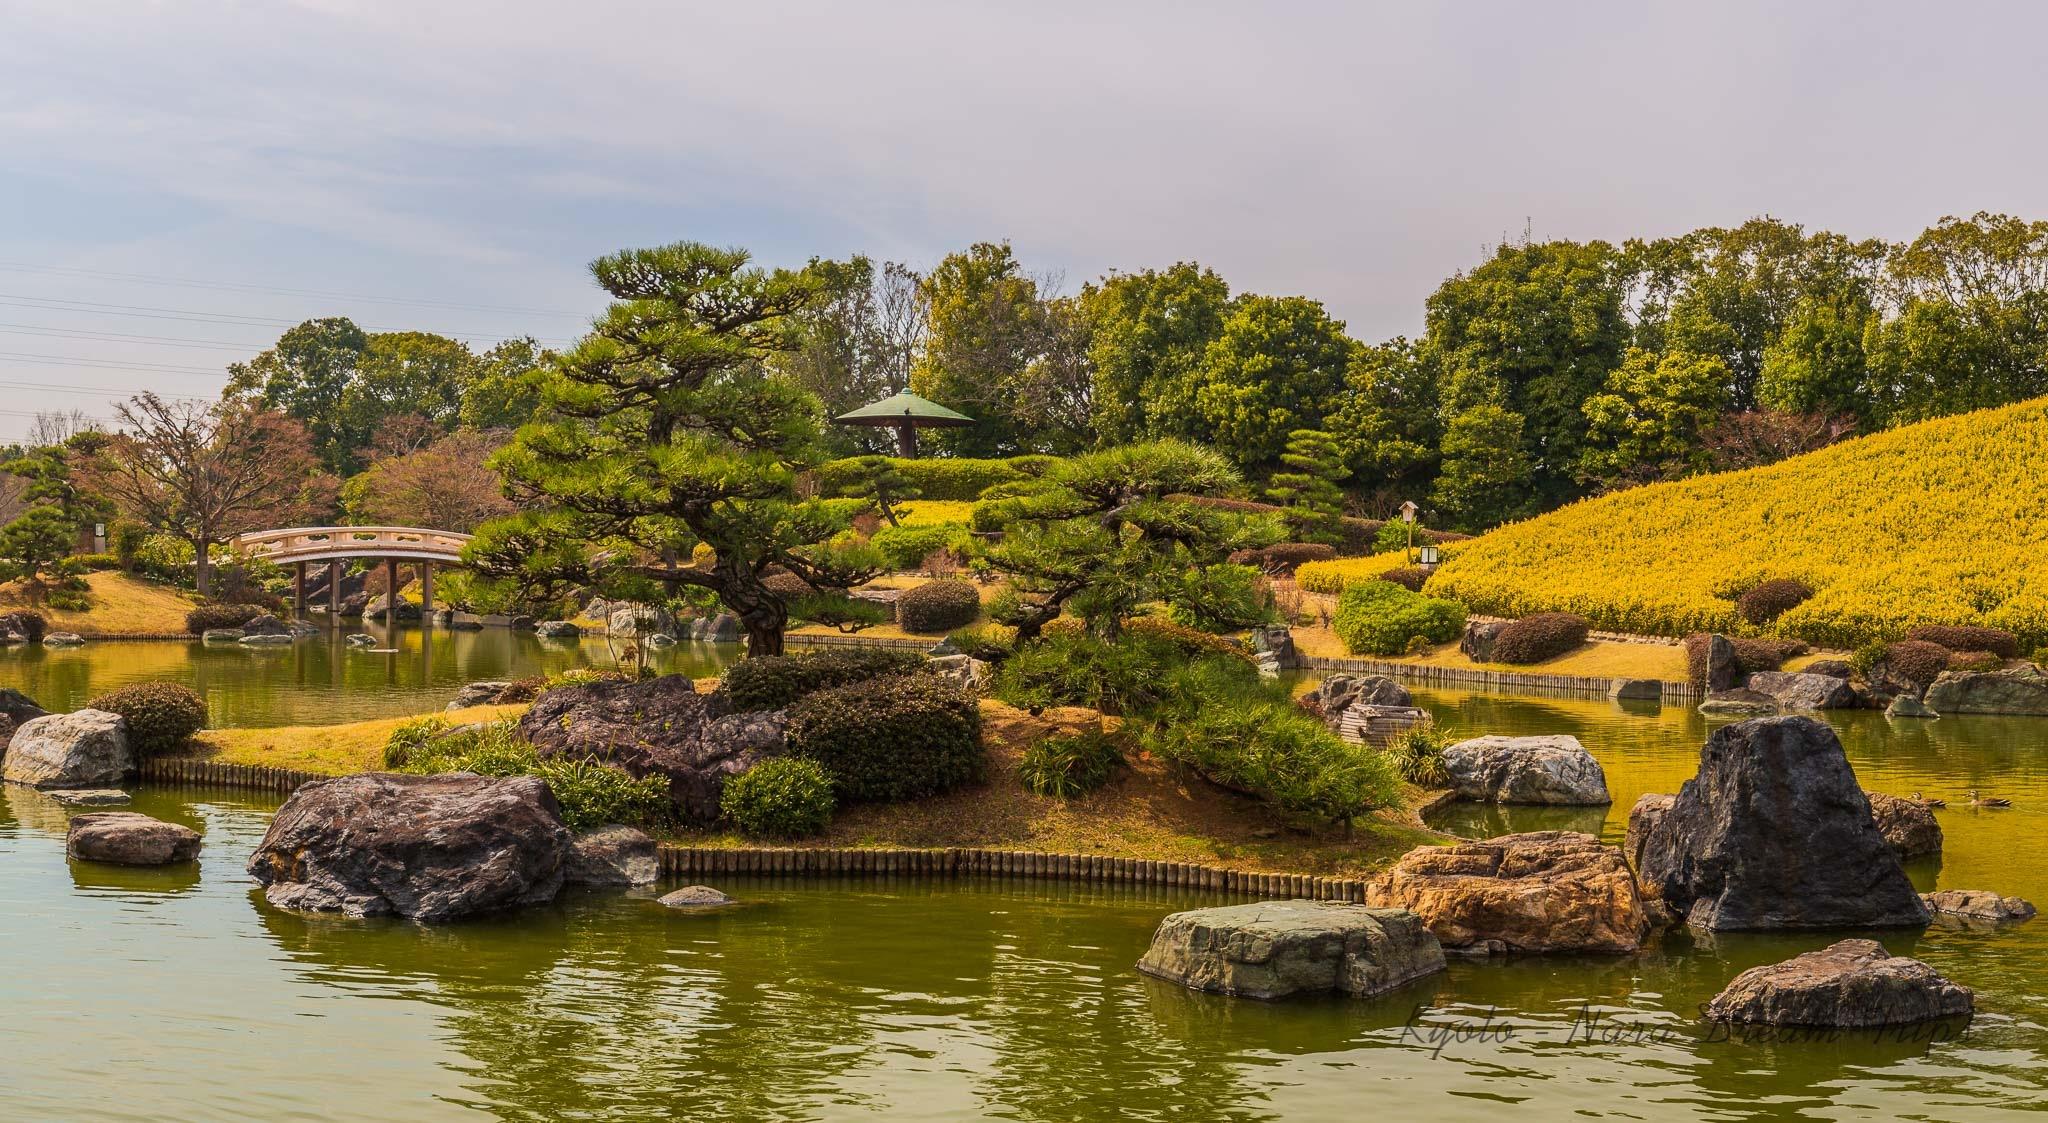 The Japanese Garden in Daisen Park, Sakai City - Ōsaka. by KyotoNaraDreamTrips